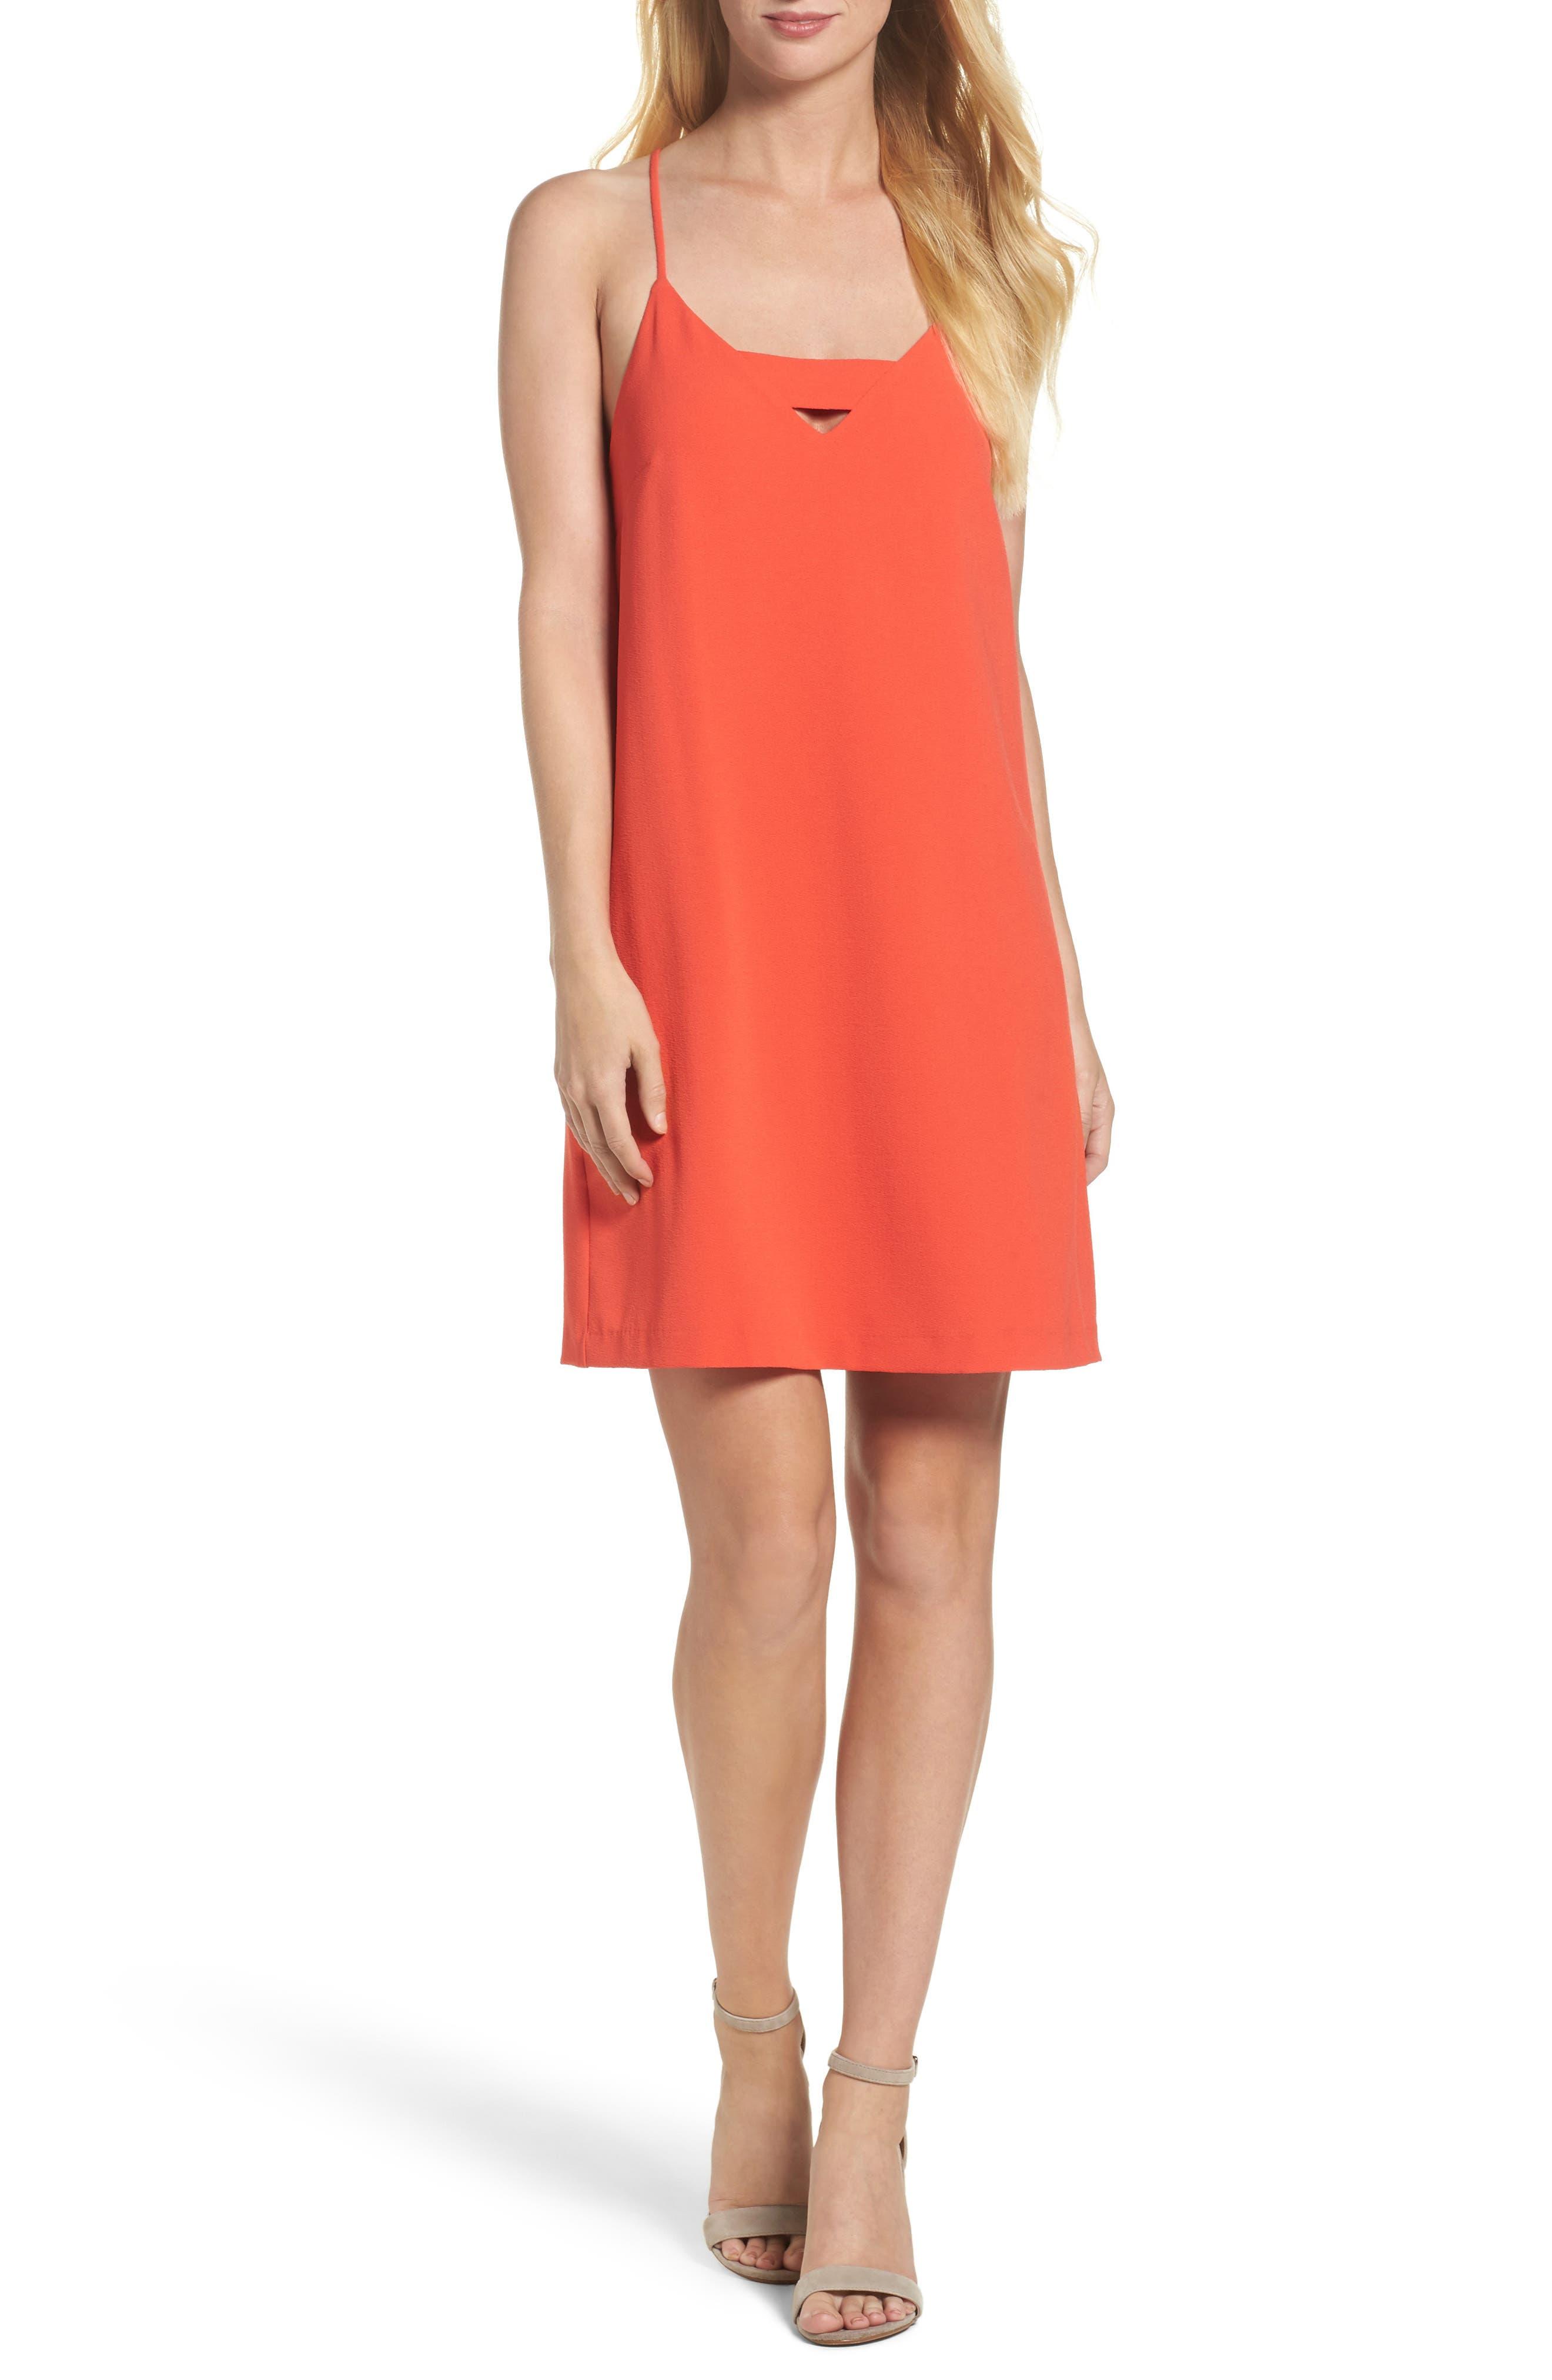 Felicity & Coco Amber Racerback Shift Dress (Nordstrom Exclusive)